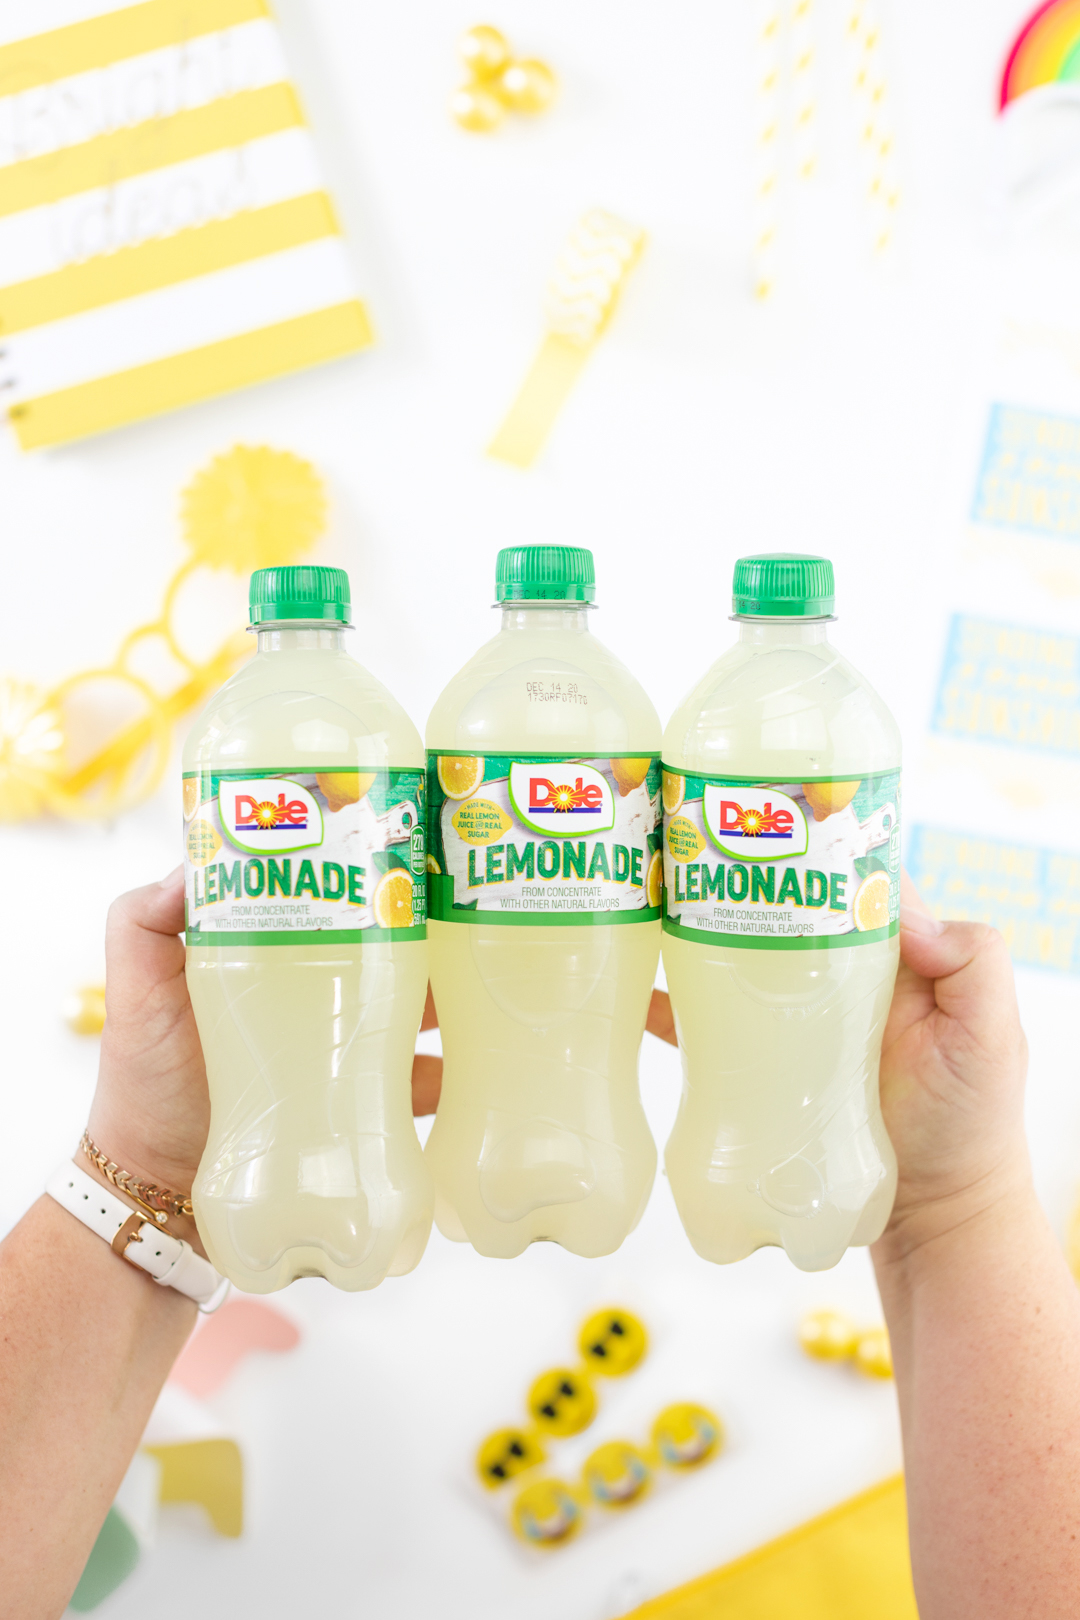 woman holding three single serve bottles of dole lemonade